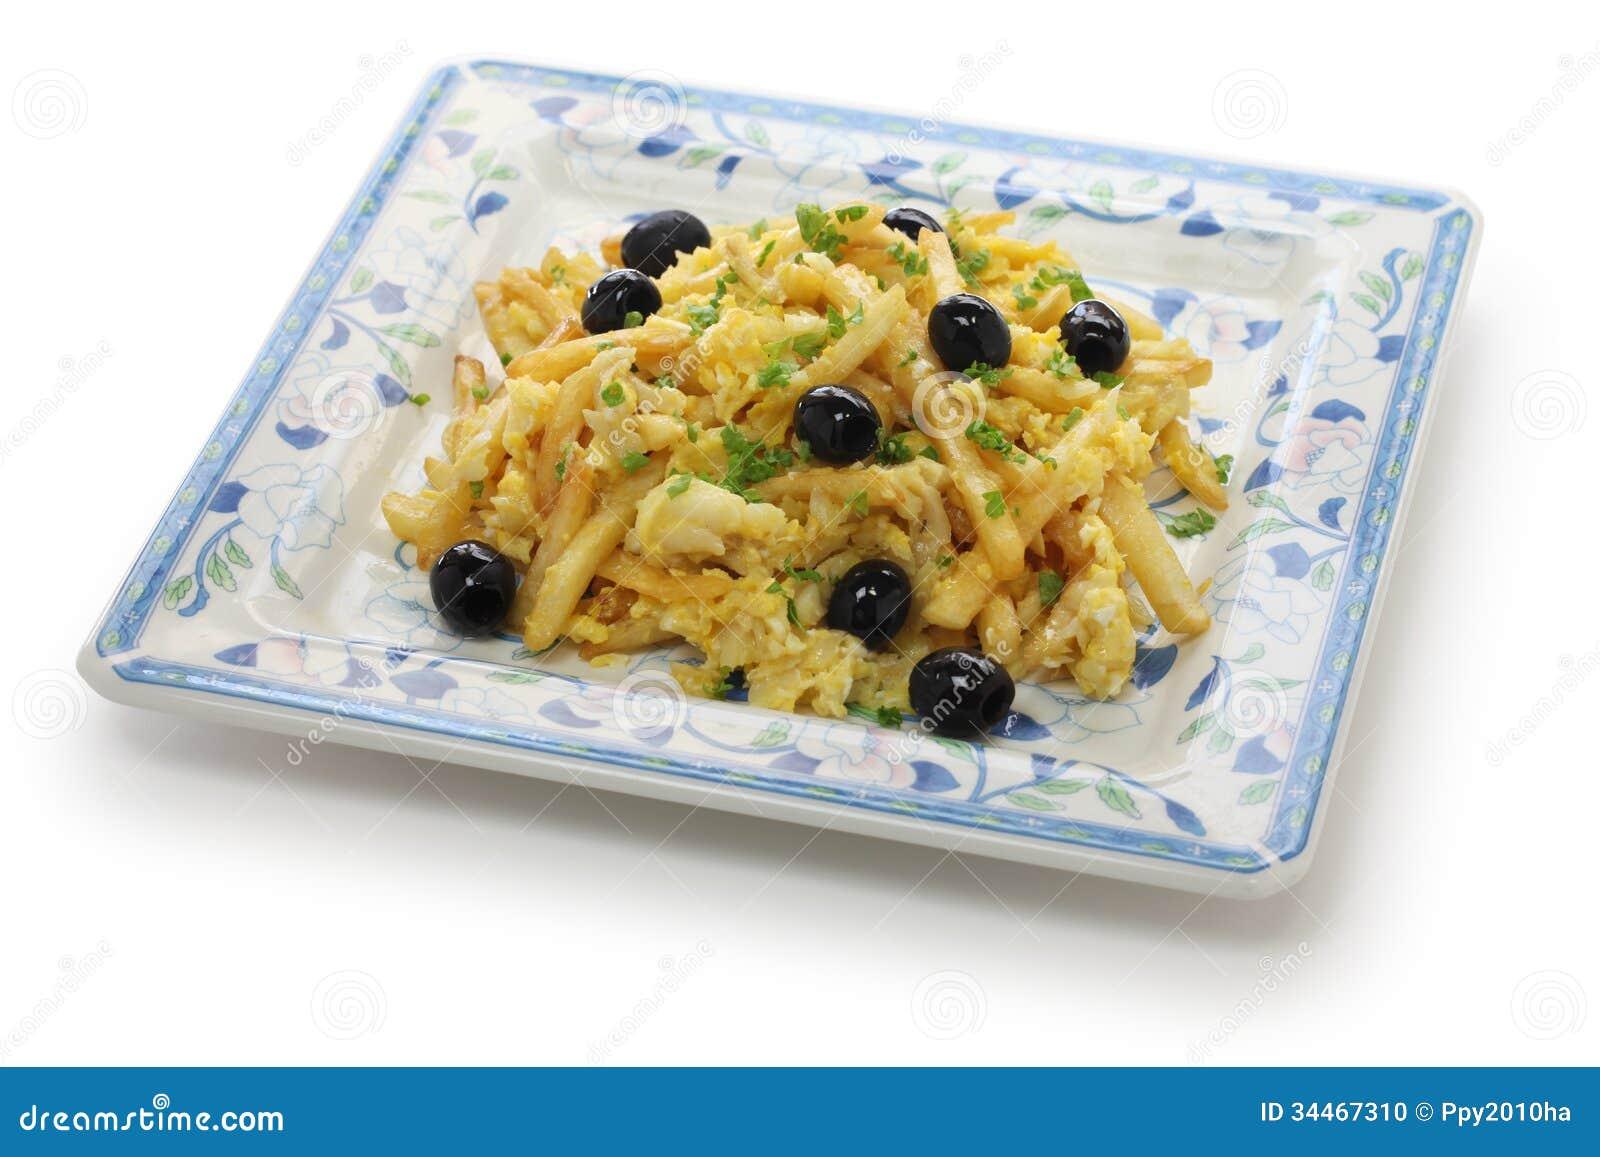 Bacalhau a bras, Portuguese cuisine, a dish with salt cod, potatoes ...